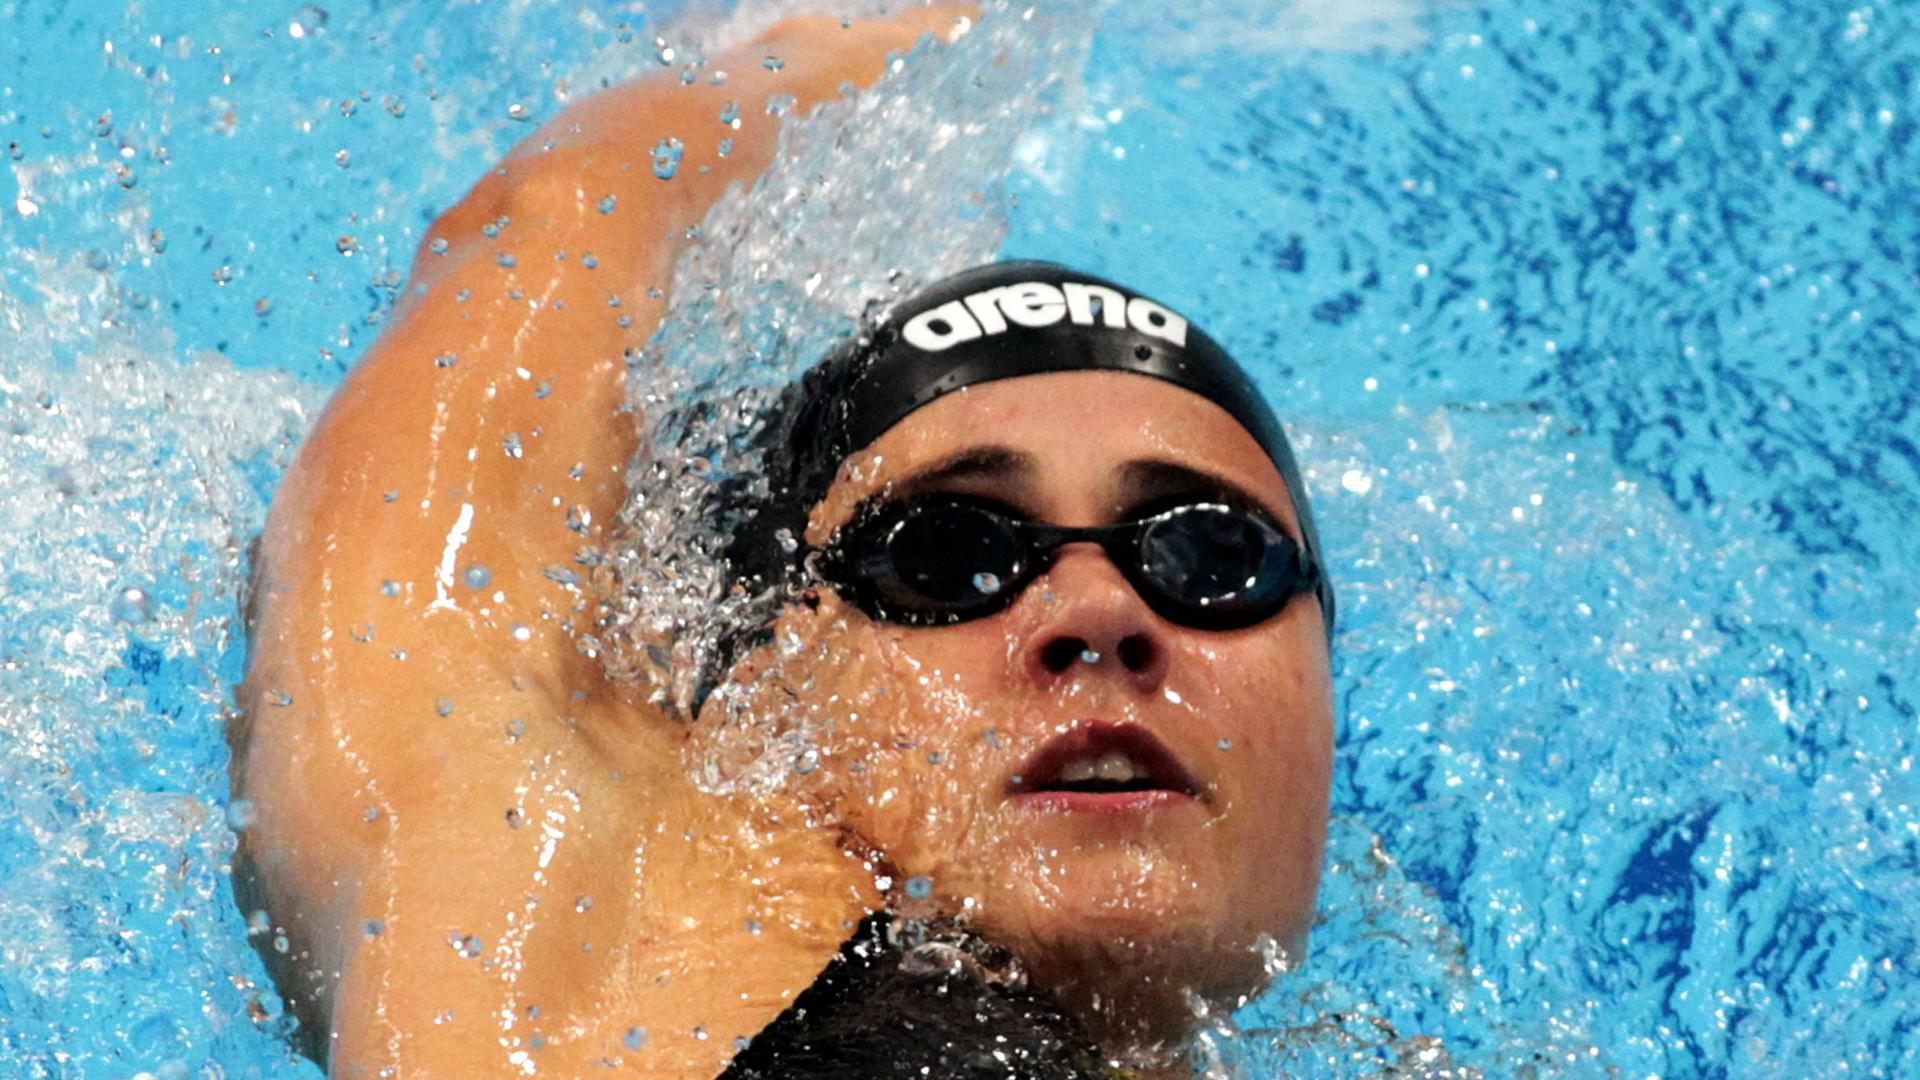 22.08.2019 Budapest(Hungary) 7fth FINA World Junior Swimming championships women s 200m backstroke Giulia Goerigk Germany : PUBLICATIONxNOTxINxSER